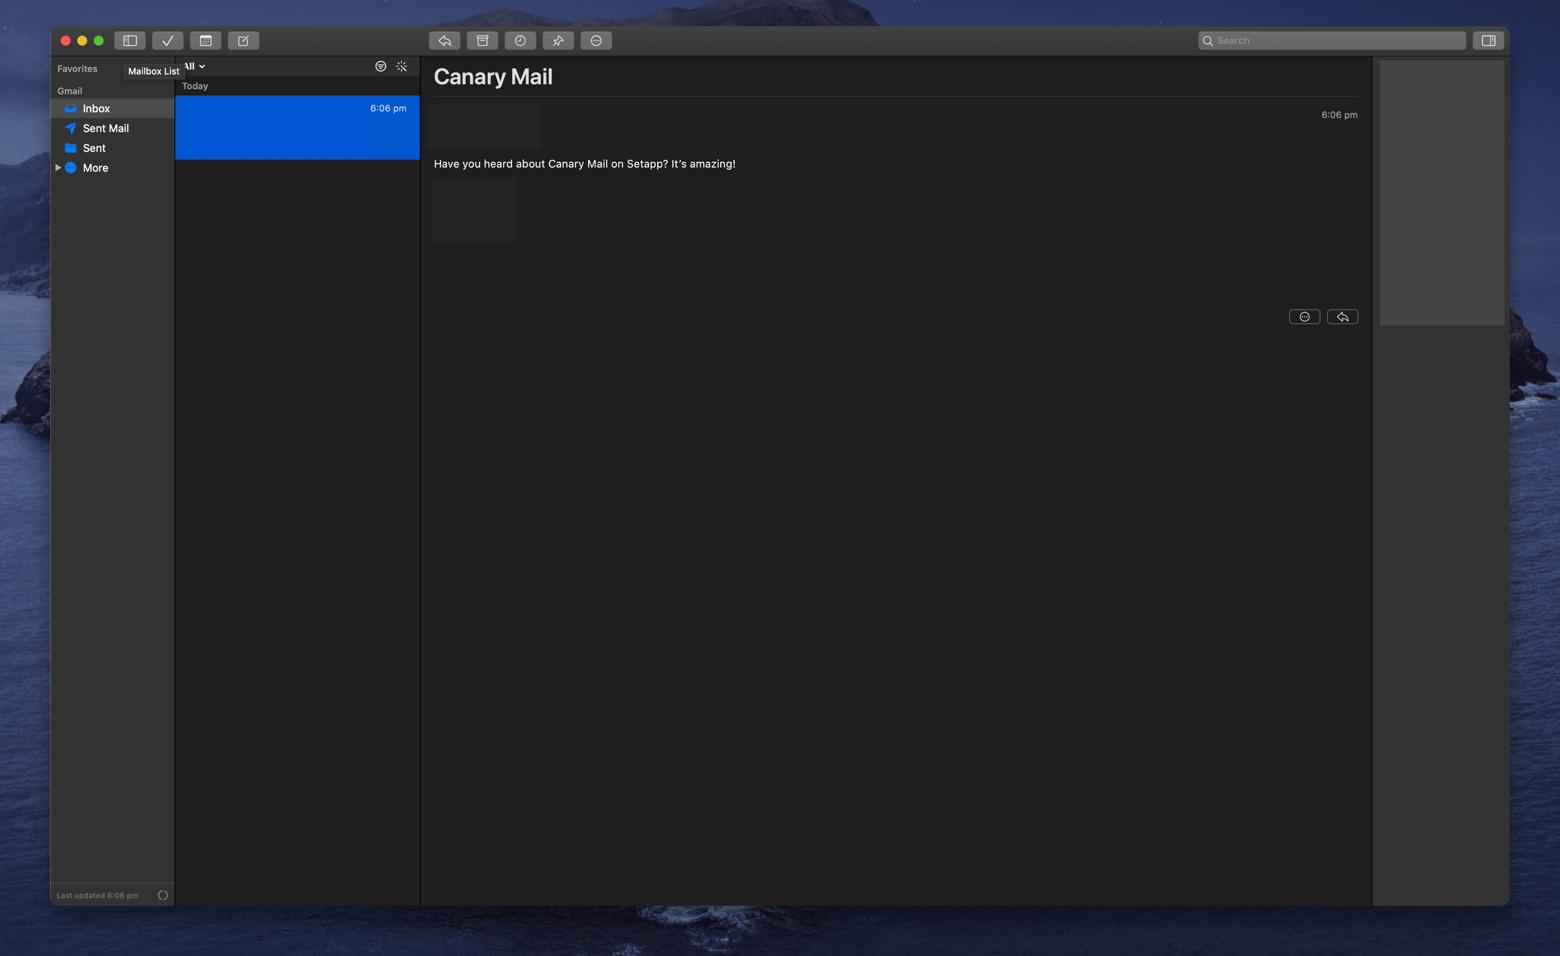 Canary Mail desktop